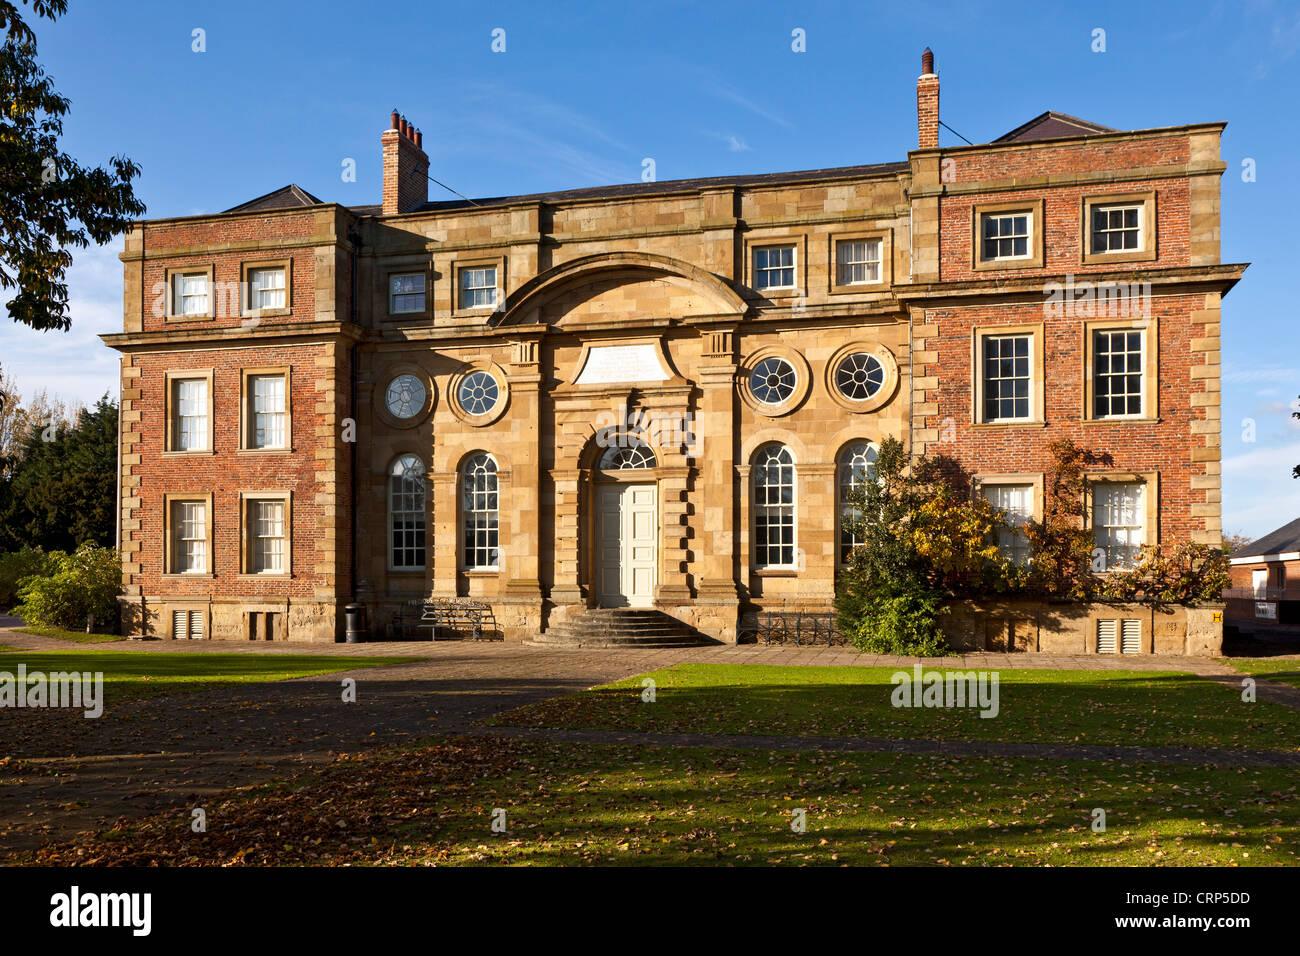 Kirkleatham Museum in Kirkleatham Old Hall, built in 1709 as a 'Free School'. Stock Photo